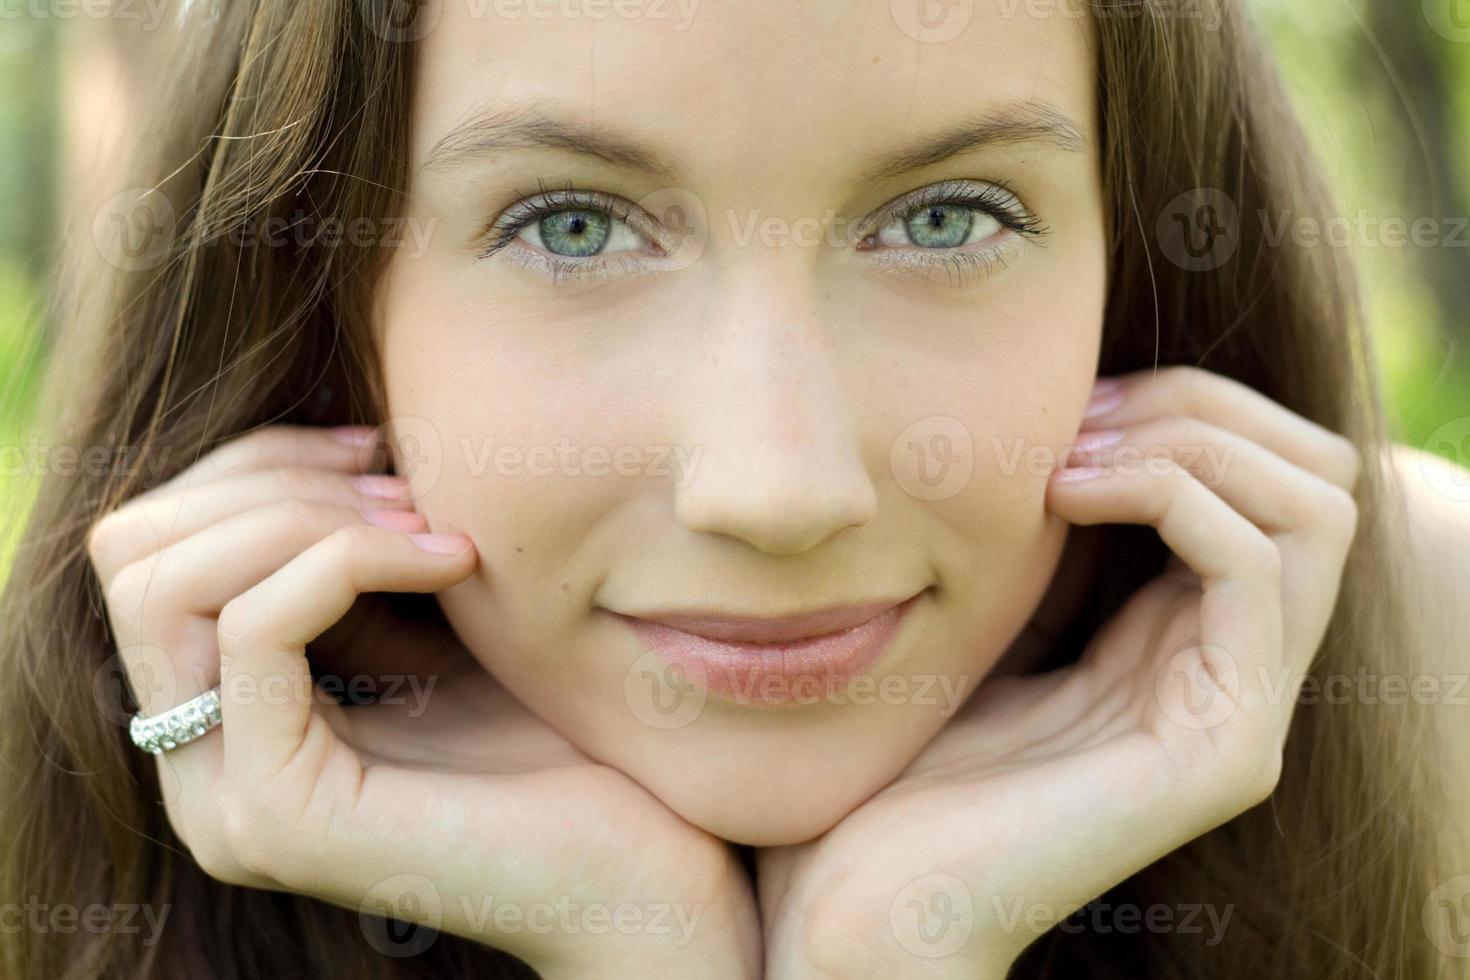 young beautiful teenager closeup portrait photo